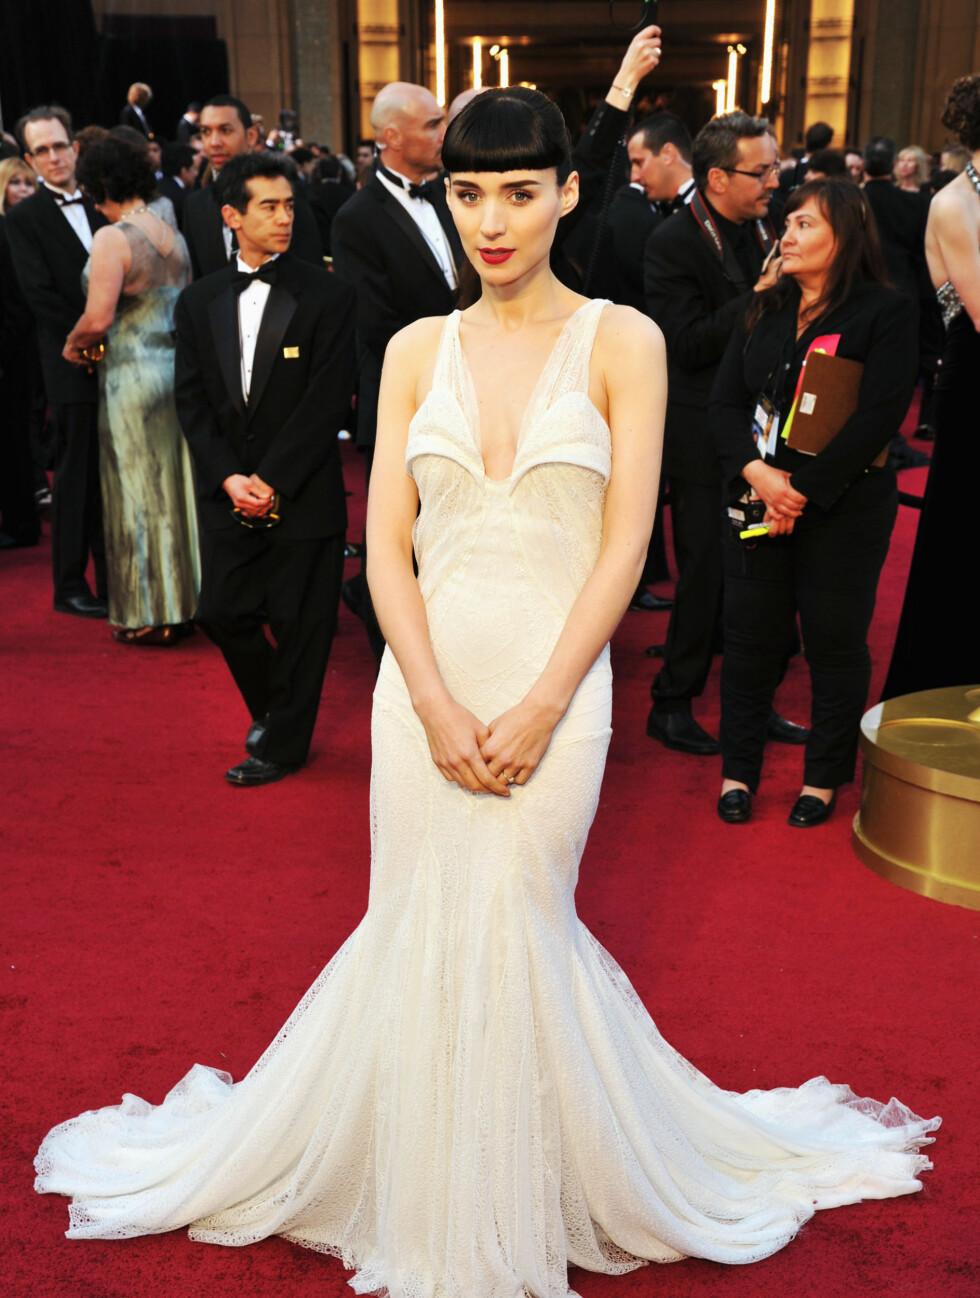 FÅR SKRYT: Rooney Mara får skryt får sin elegante kjole fra Givenchy og hylles blant annet for sin kontrastfylte stil.  Foto: All Over Press